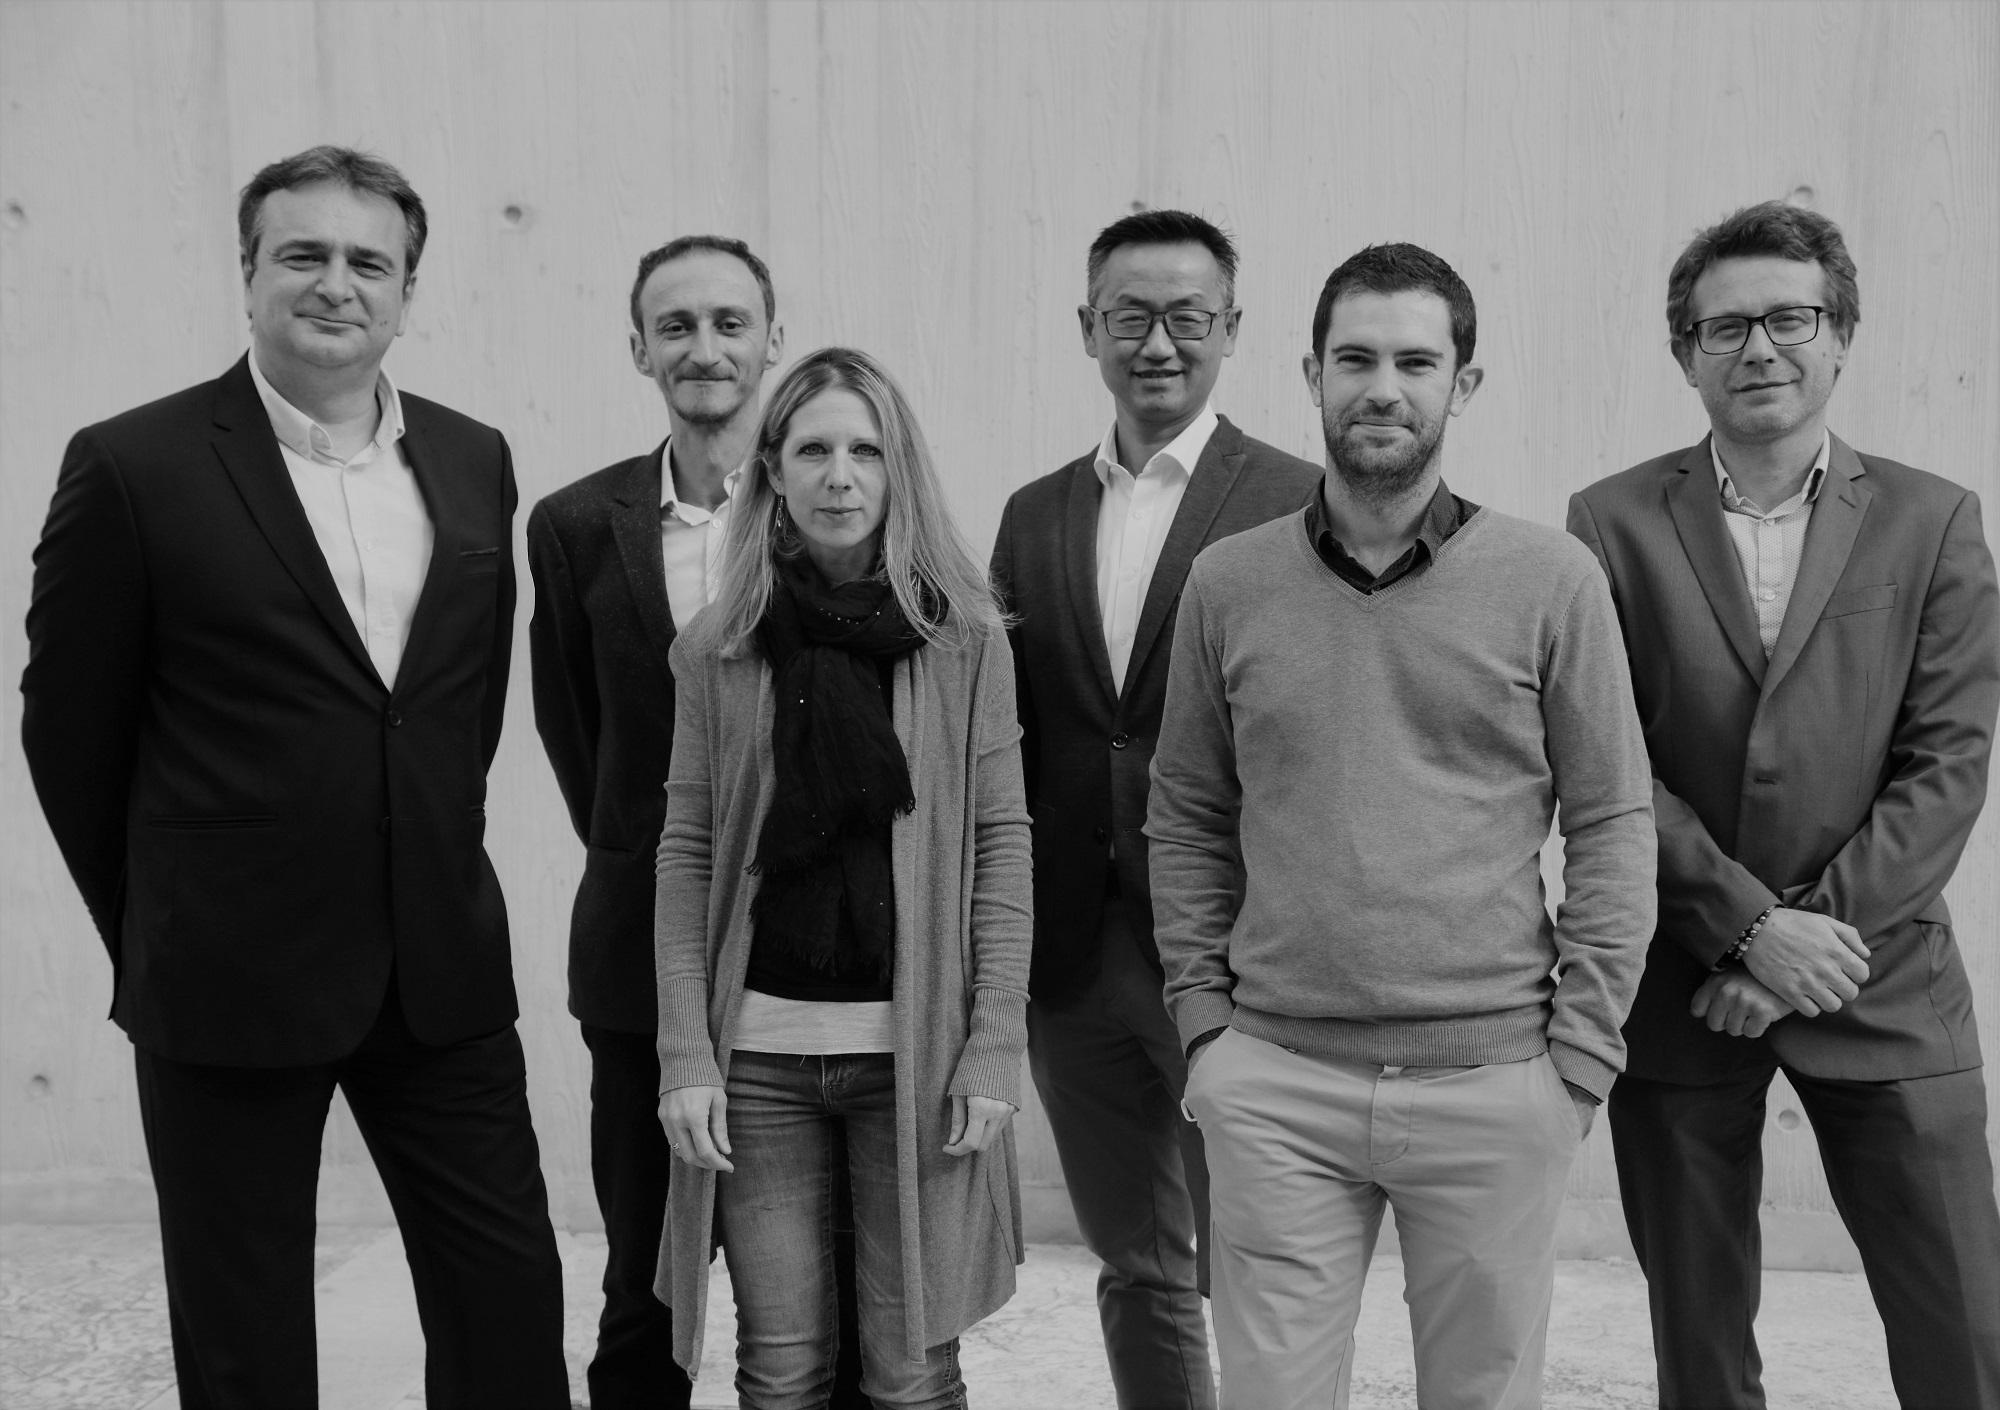 Heads of C4Diagnostics - November 2020